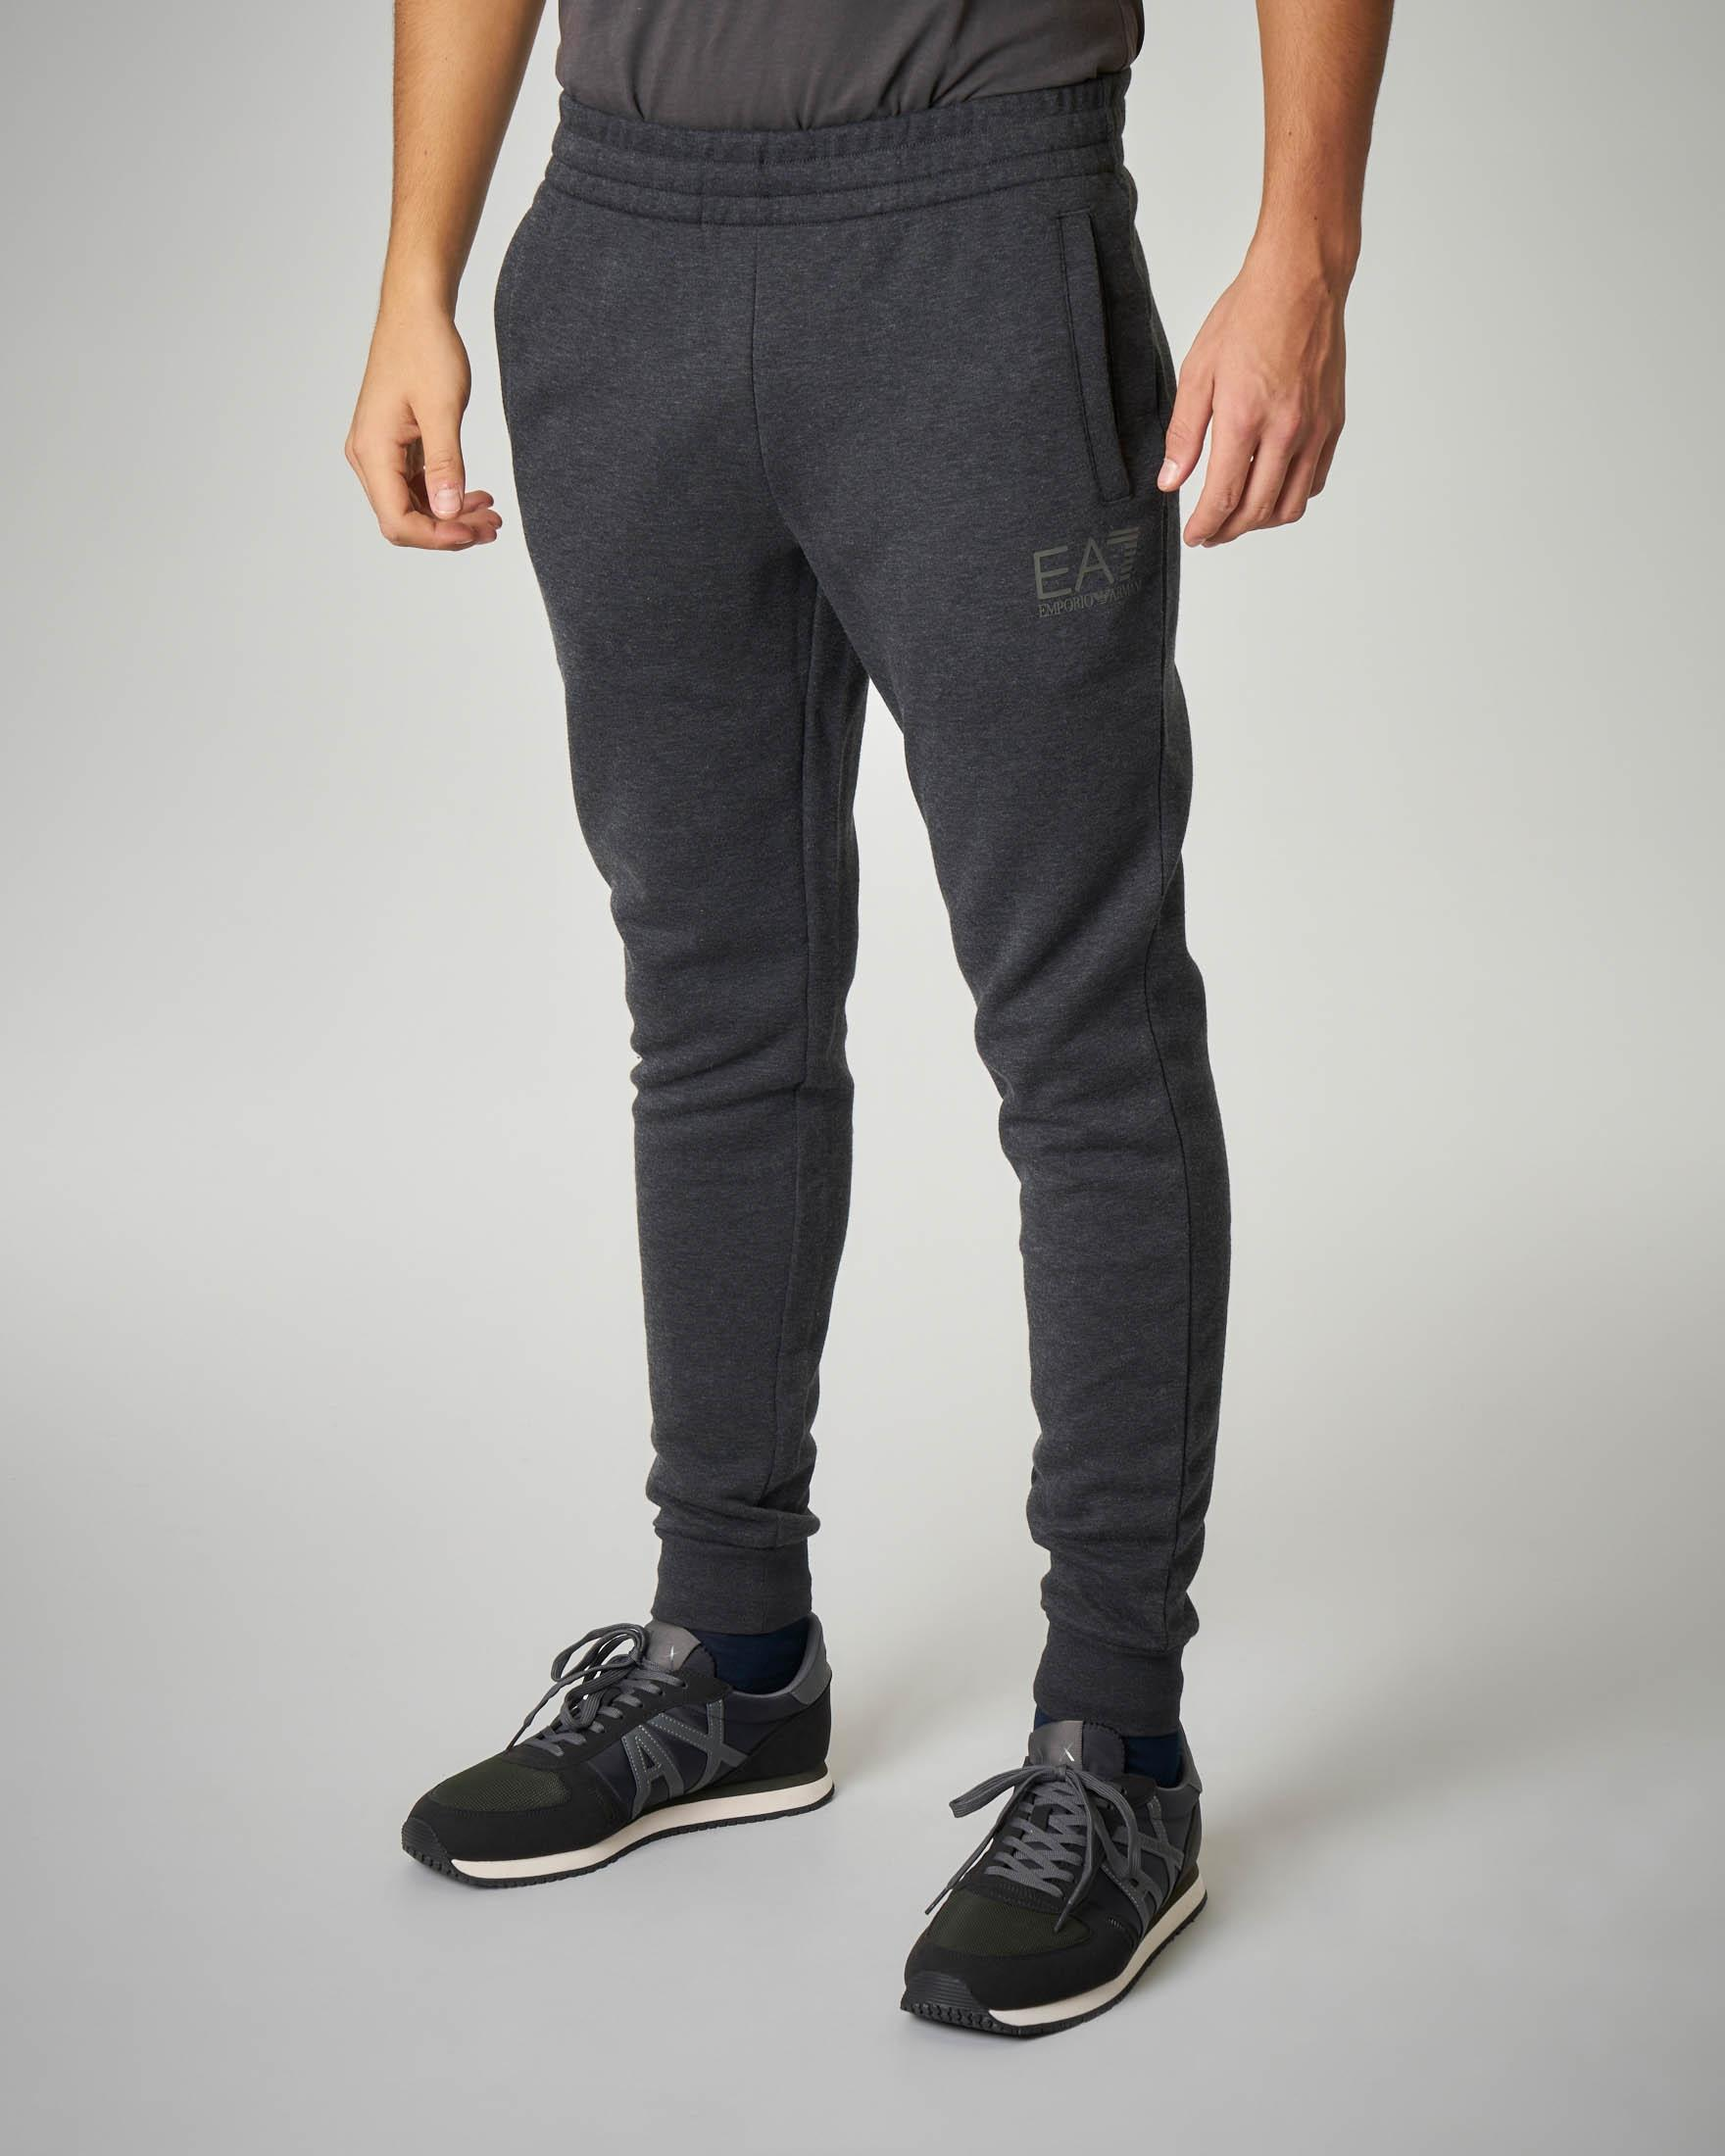 Pantalone grigio scuro melange in felpa leggera